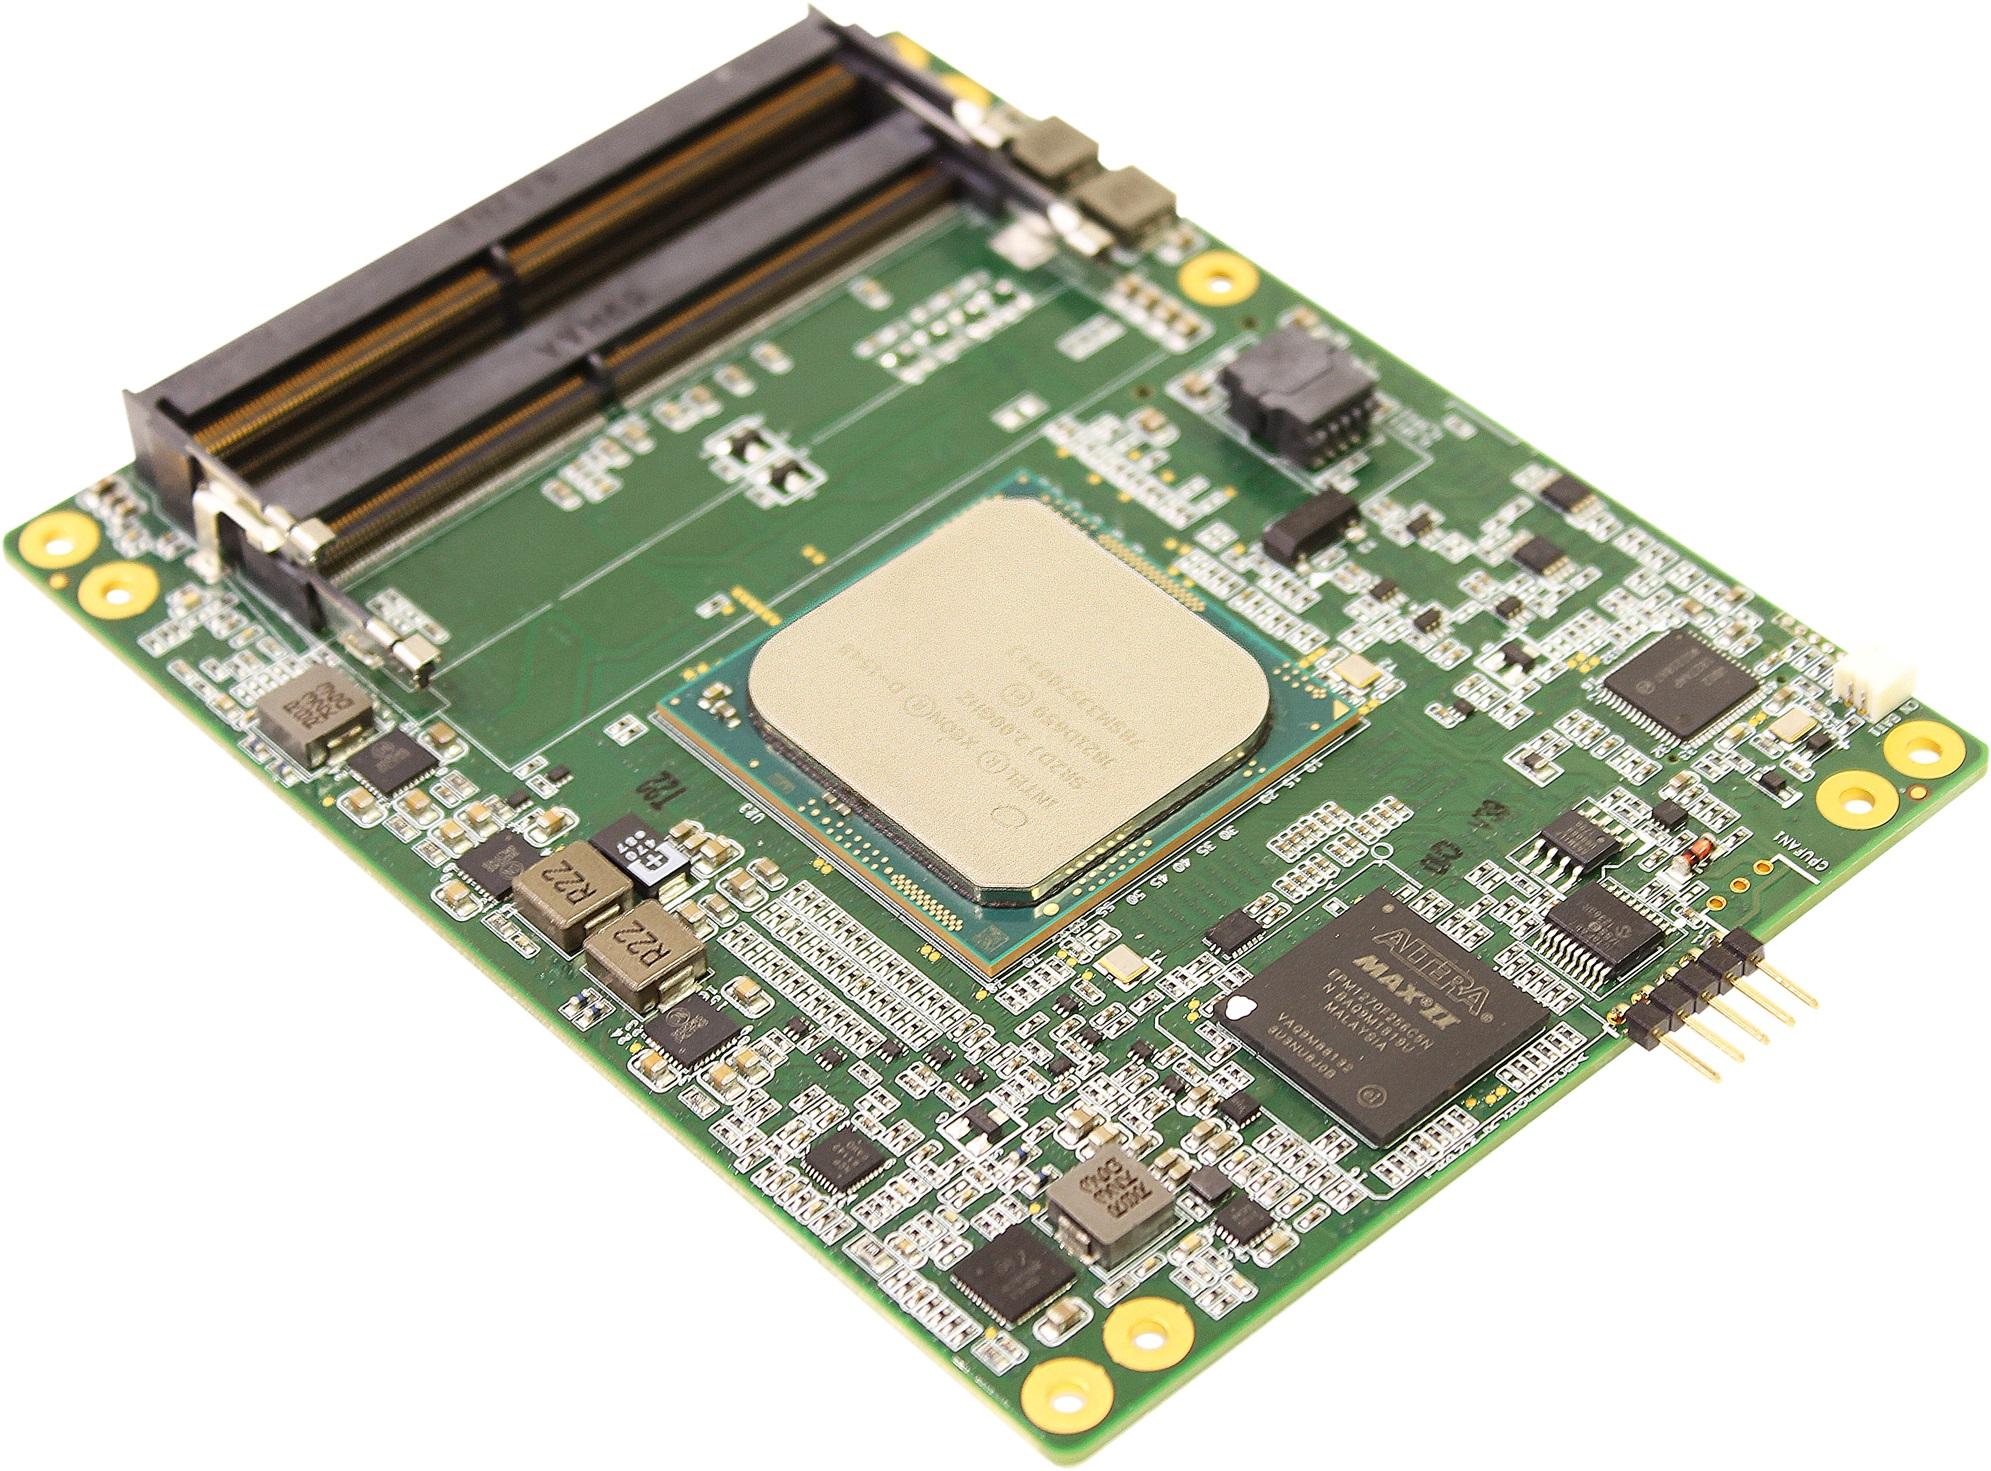 Acrosser ACM-XD15MT COM Express Type 7 Module is Released